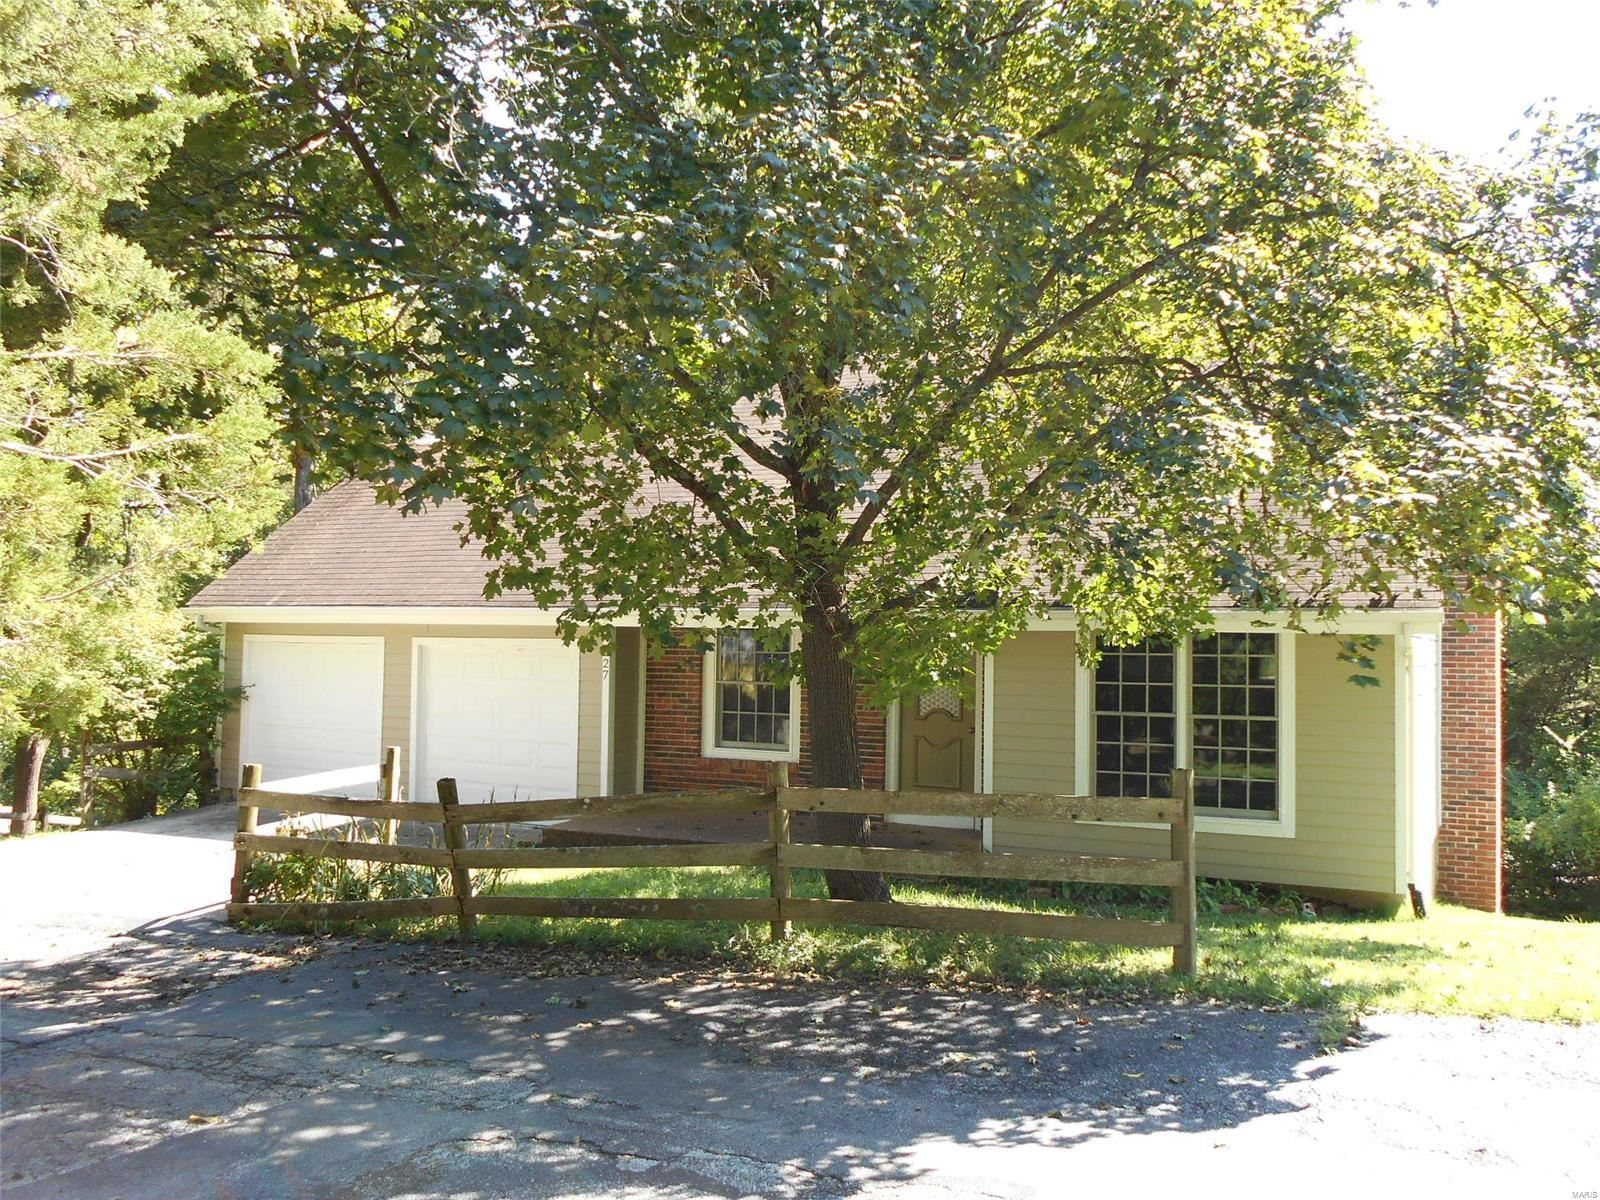 227 Walden Court, Eureka, MO 63025 - MLS#: 21065779